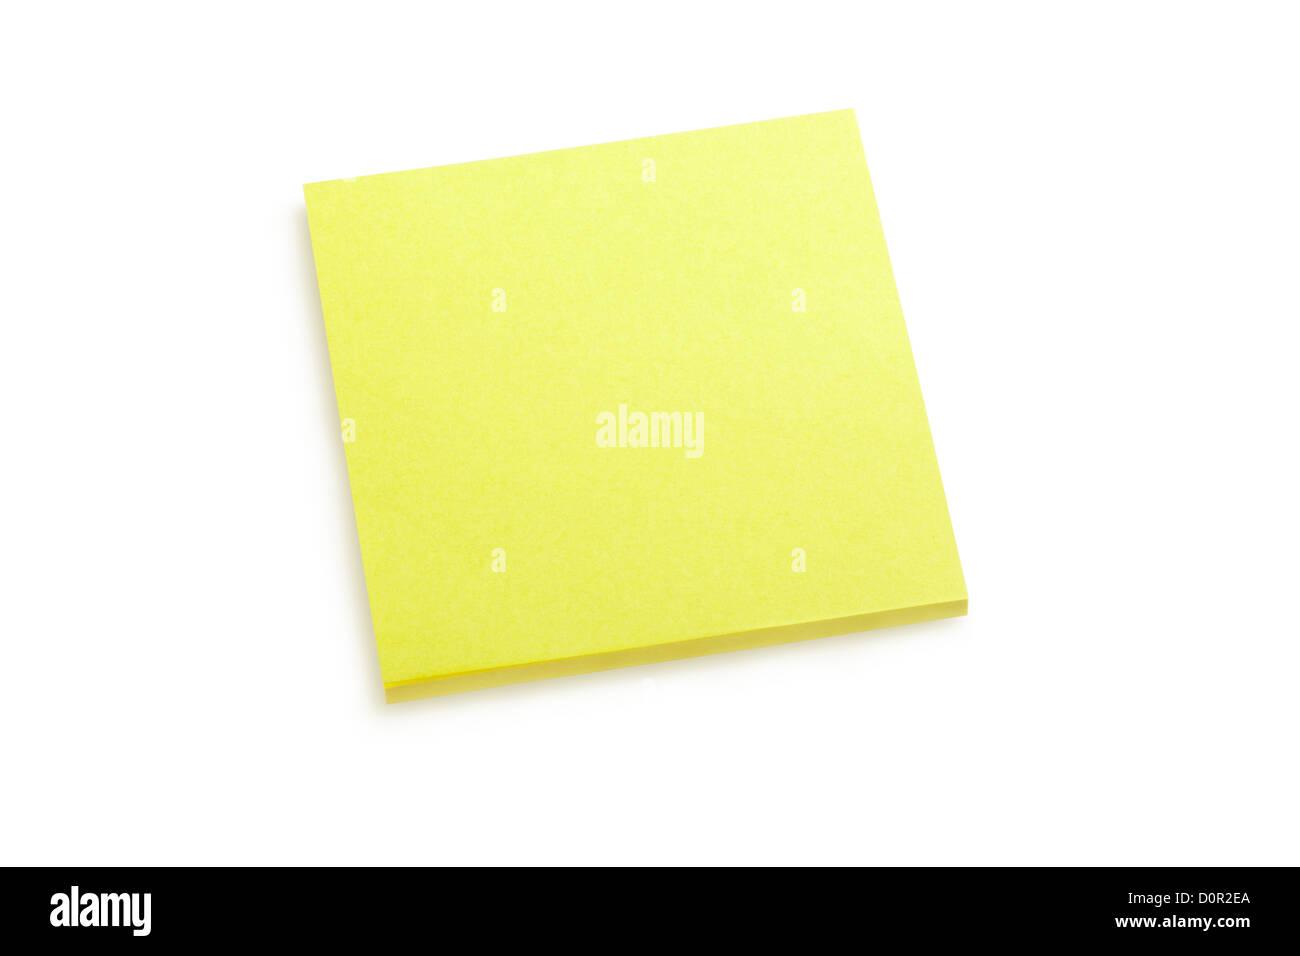 Yellow sticker note on white - Stock Image